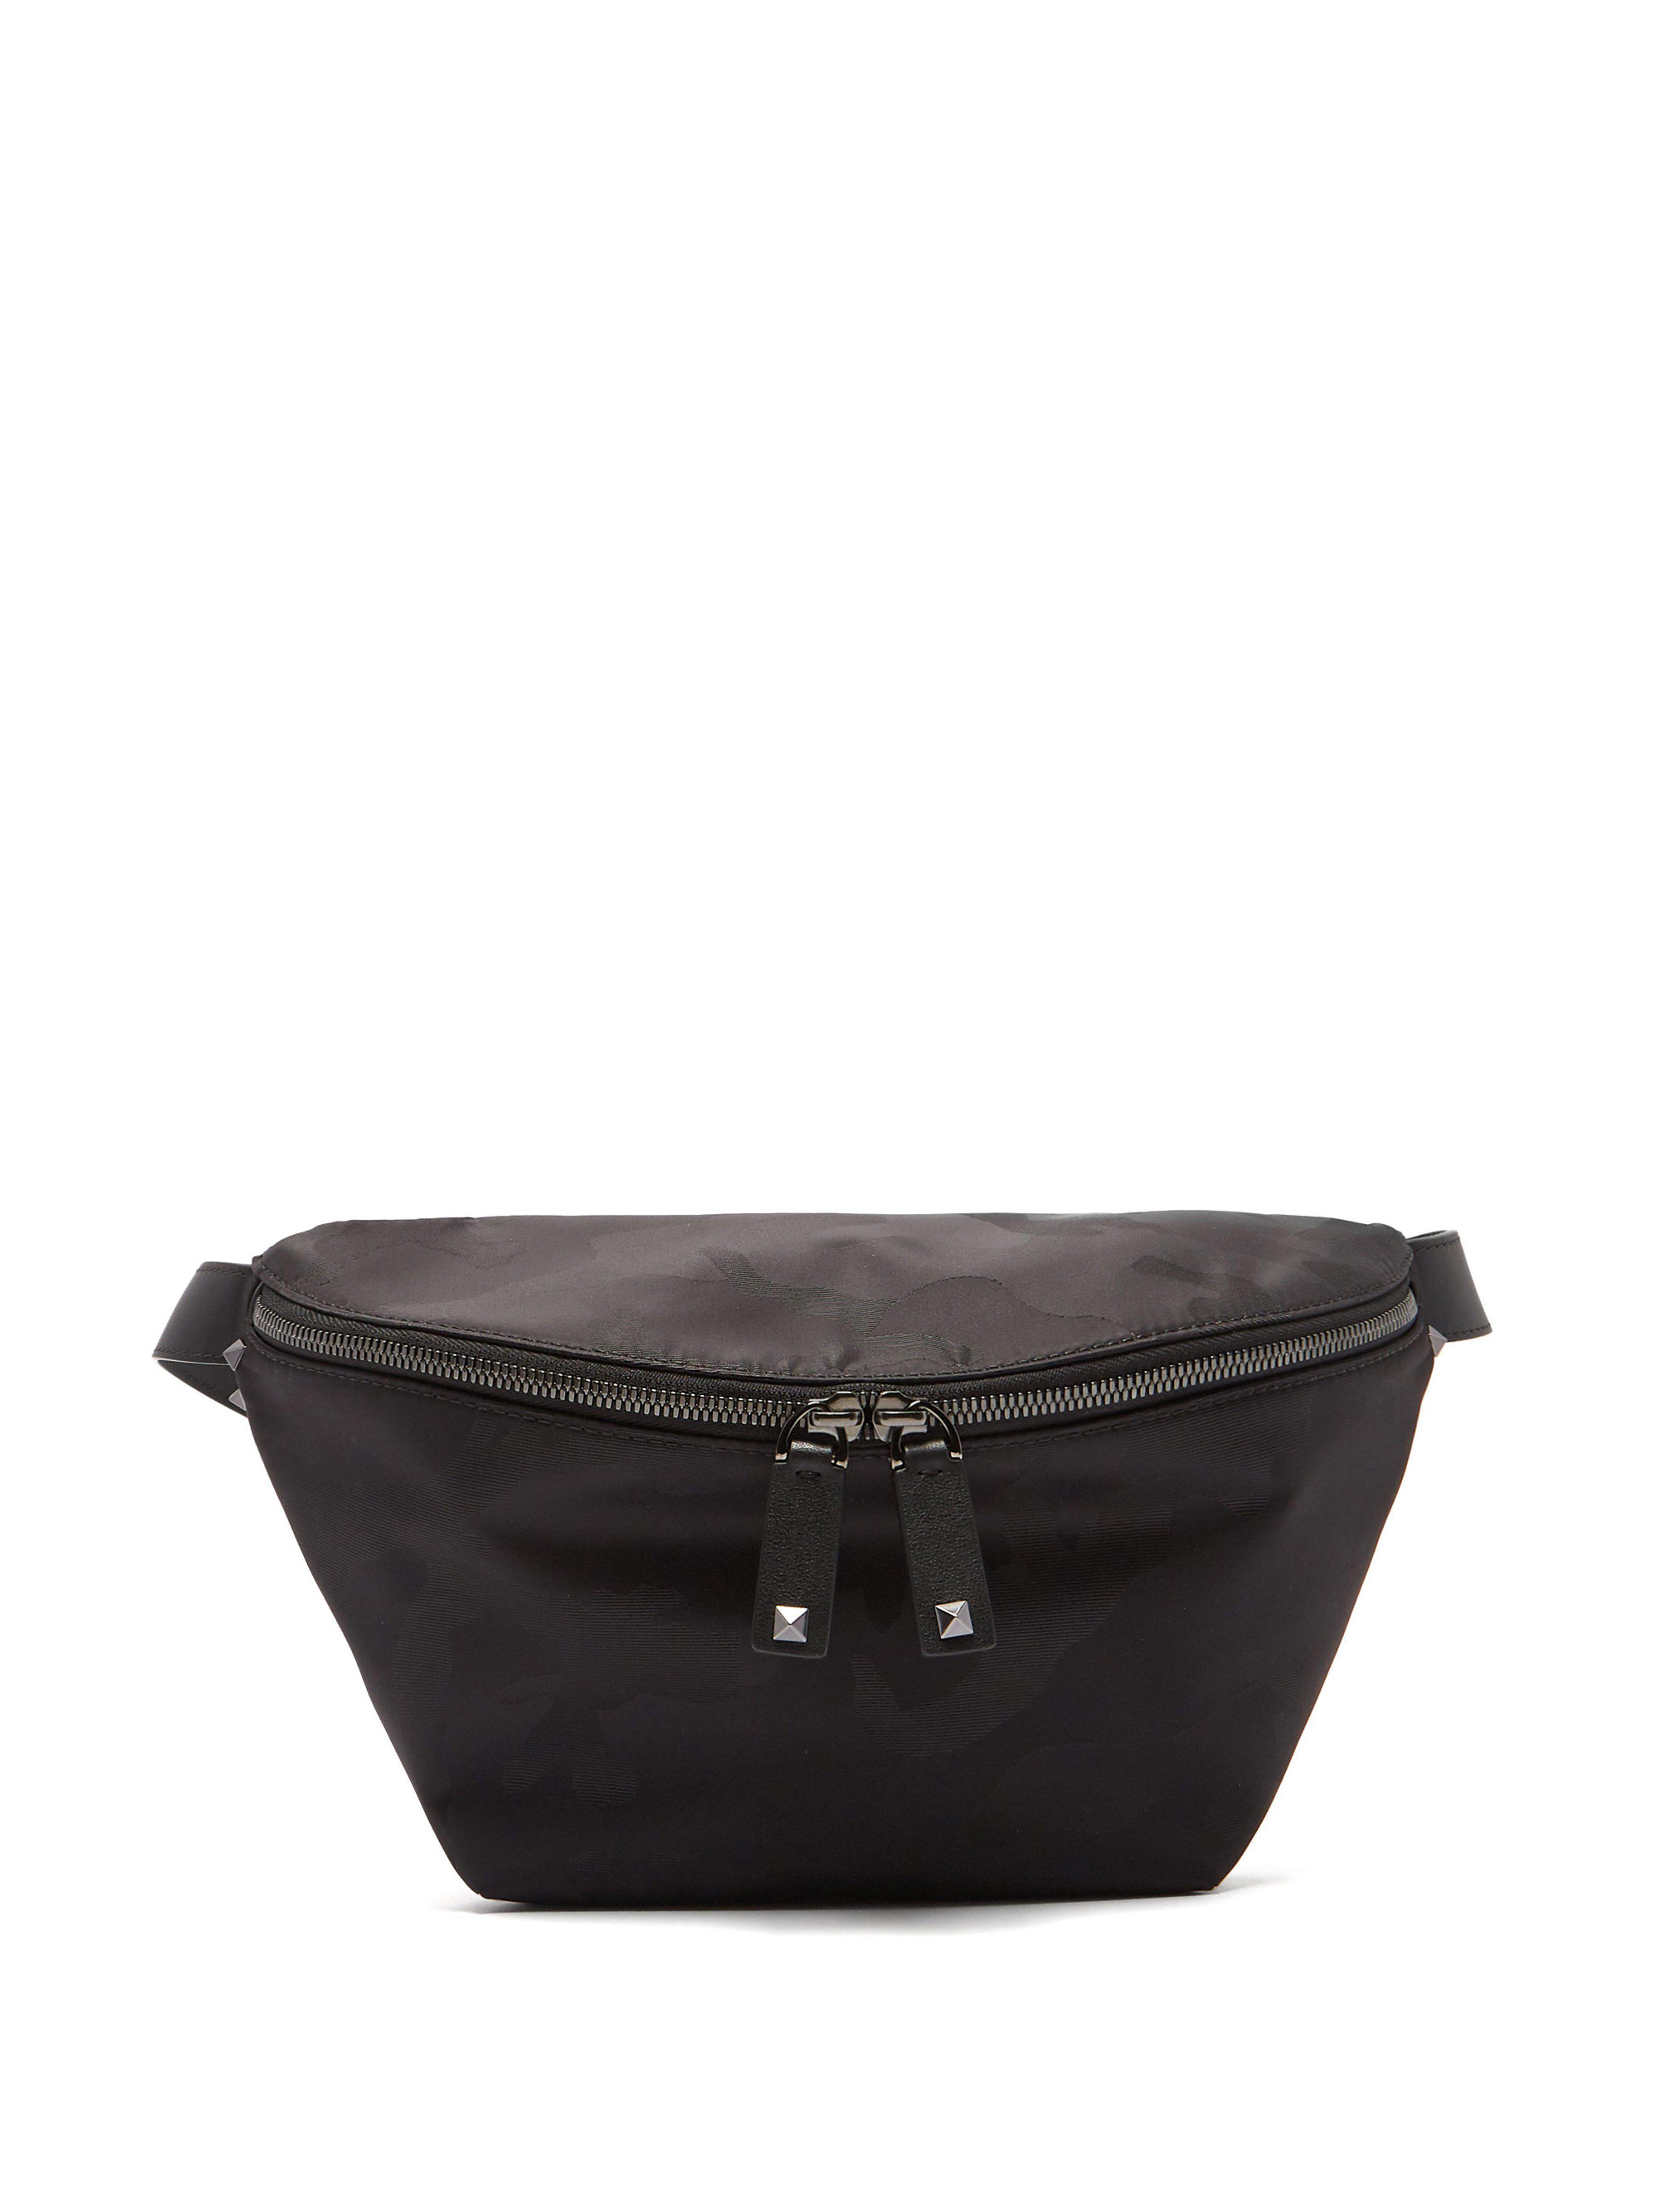 f3b5f5ecba0 Valentino Rockstud Camouflage Jacquard Nylon Belt Bag in Black for ...